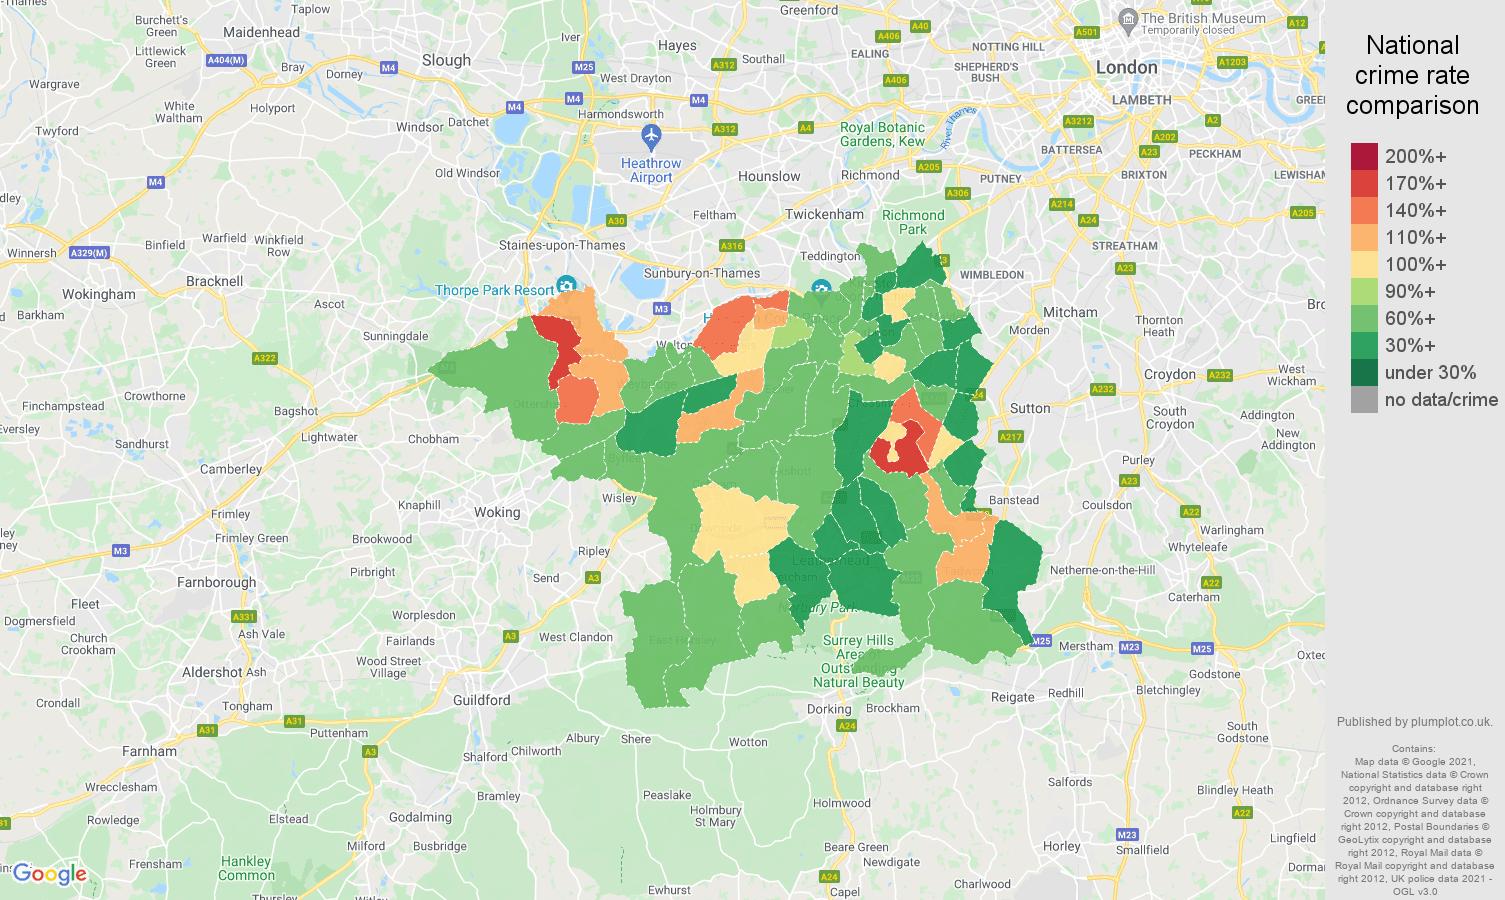 Kingston upon Thames criminal damage and arson crime rate comparison map